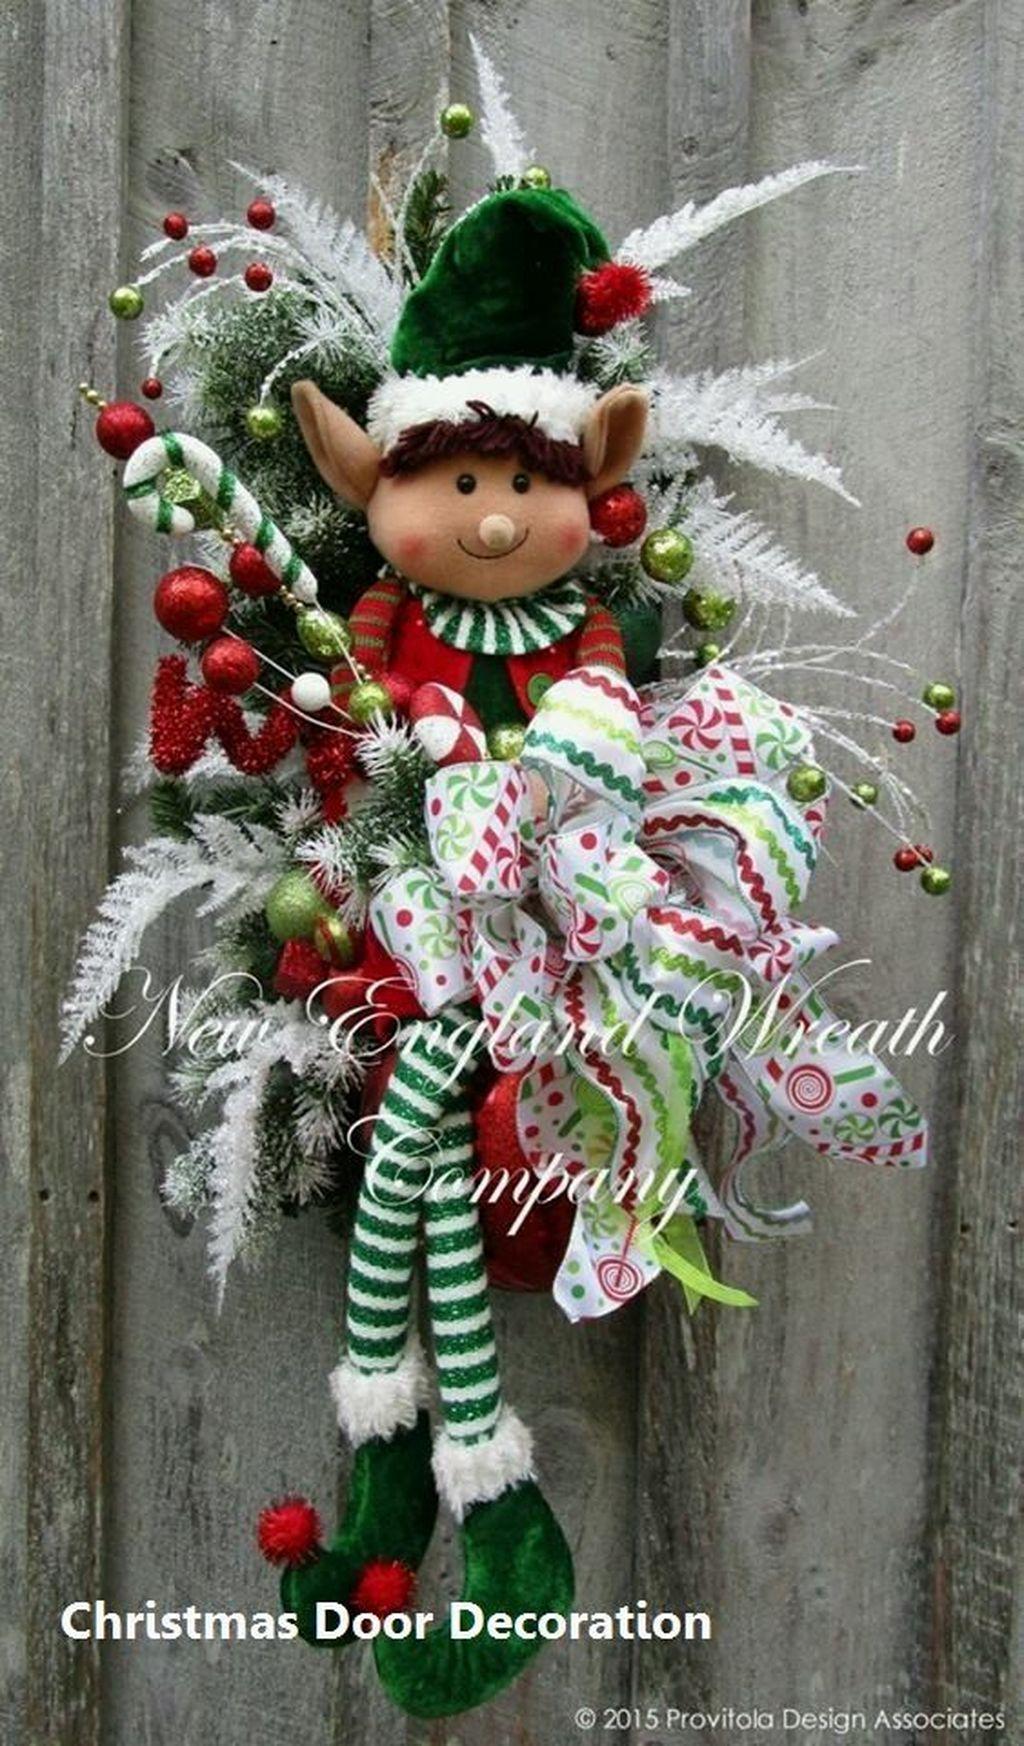 Creative Christmas Door Decoration Ideas To Inspire You 13